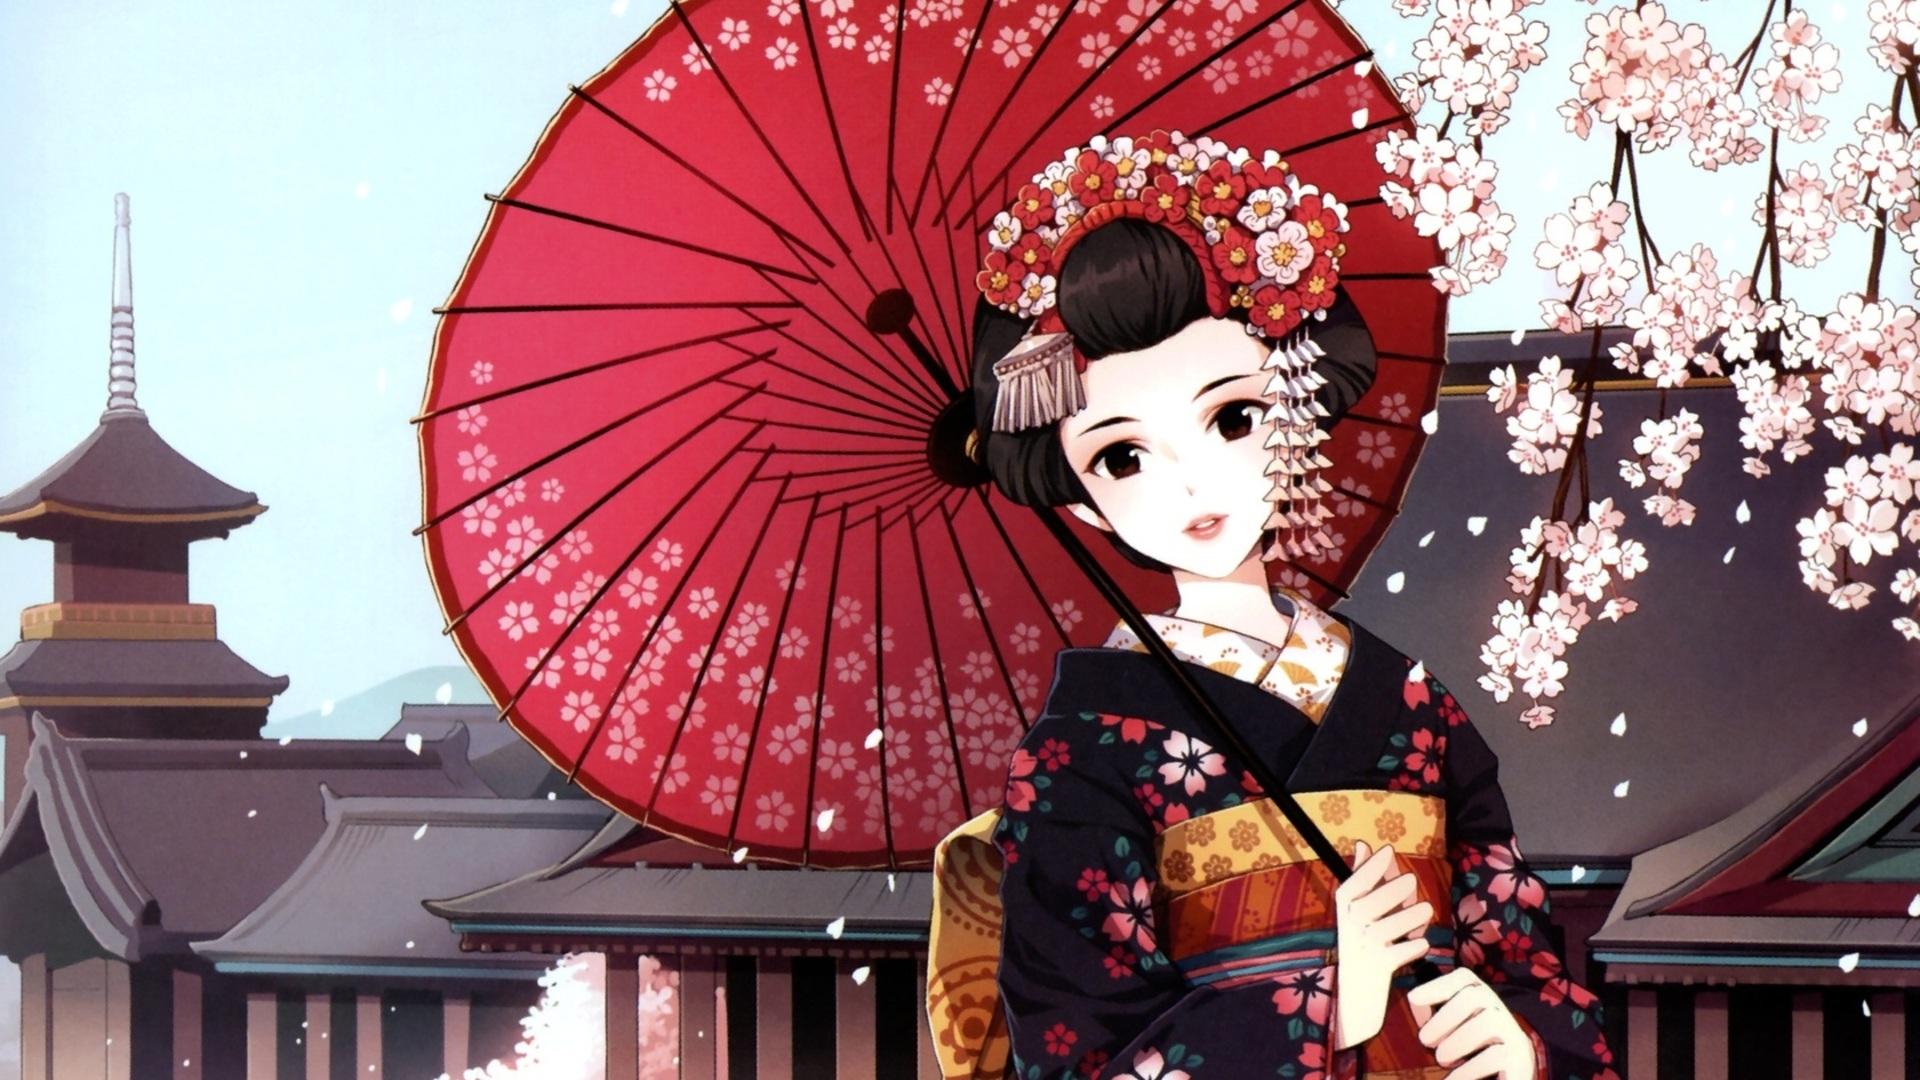 Fukiyose Seiri Hd Wallpapers Next Post Blue Anime Sky Hd Wallpapers 1920x1080